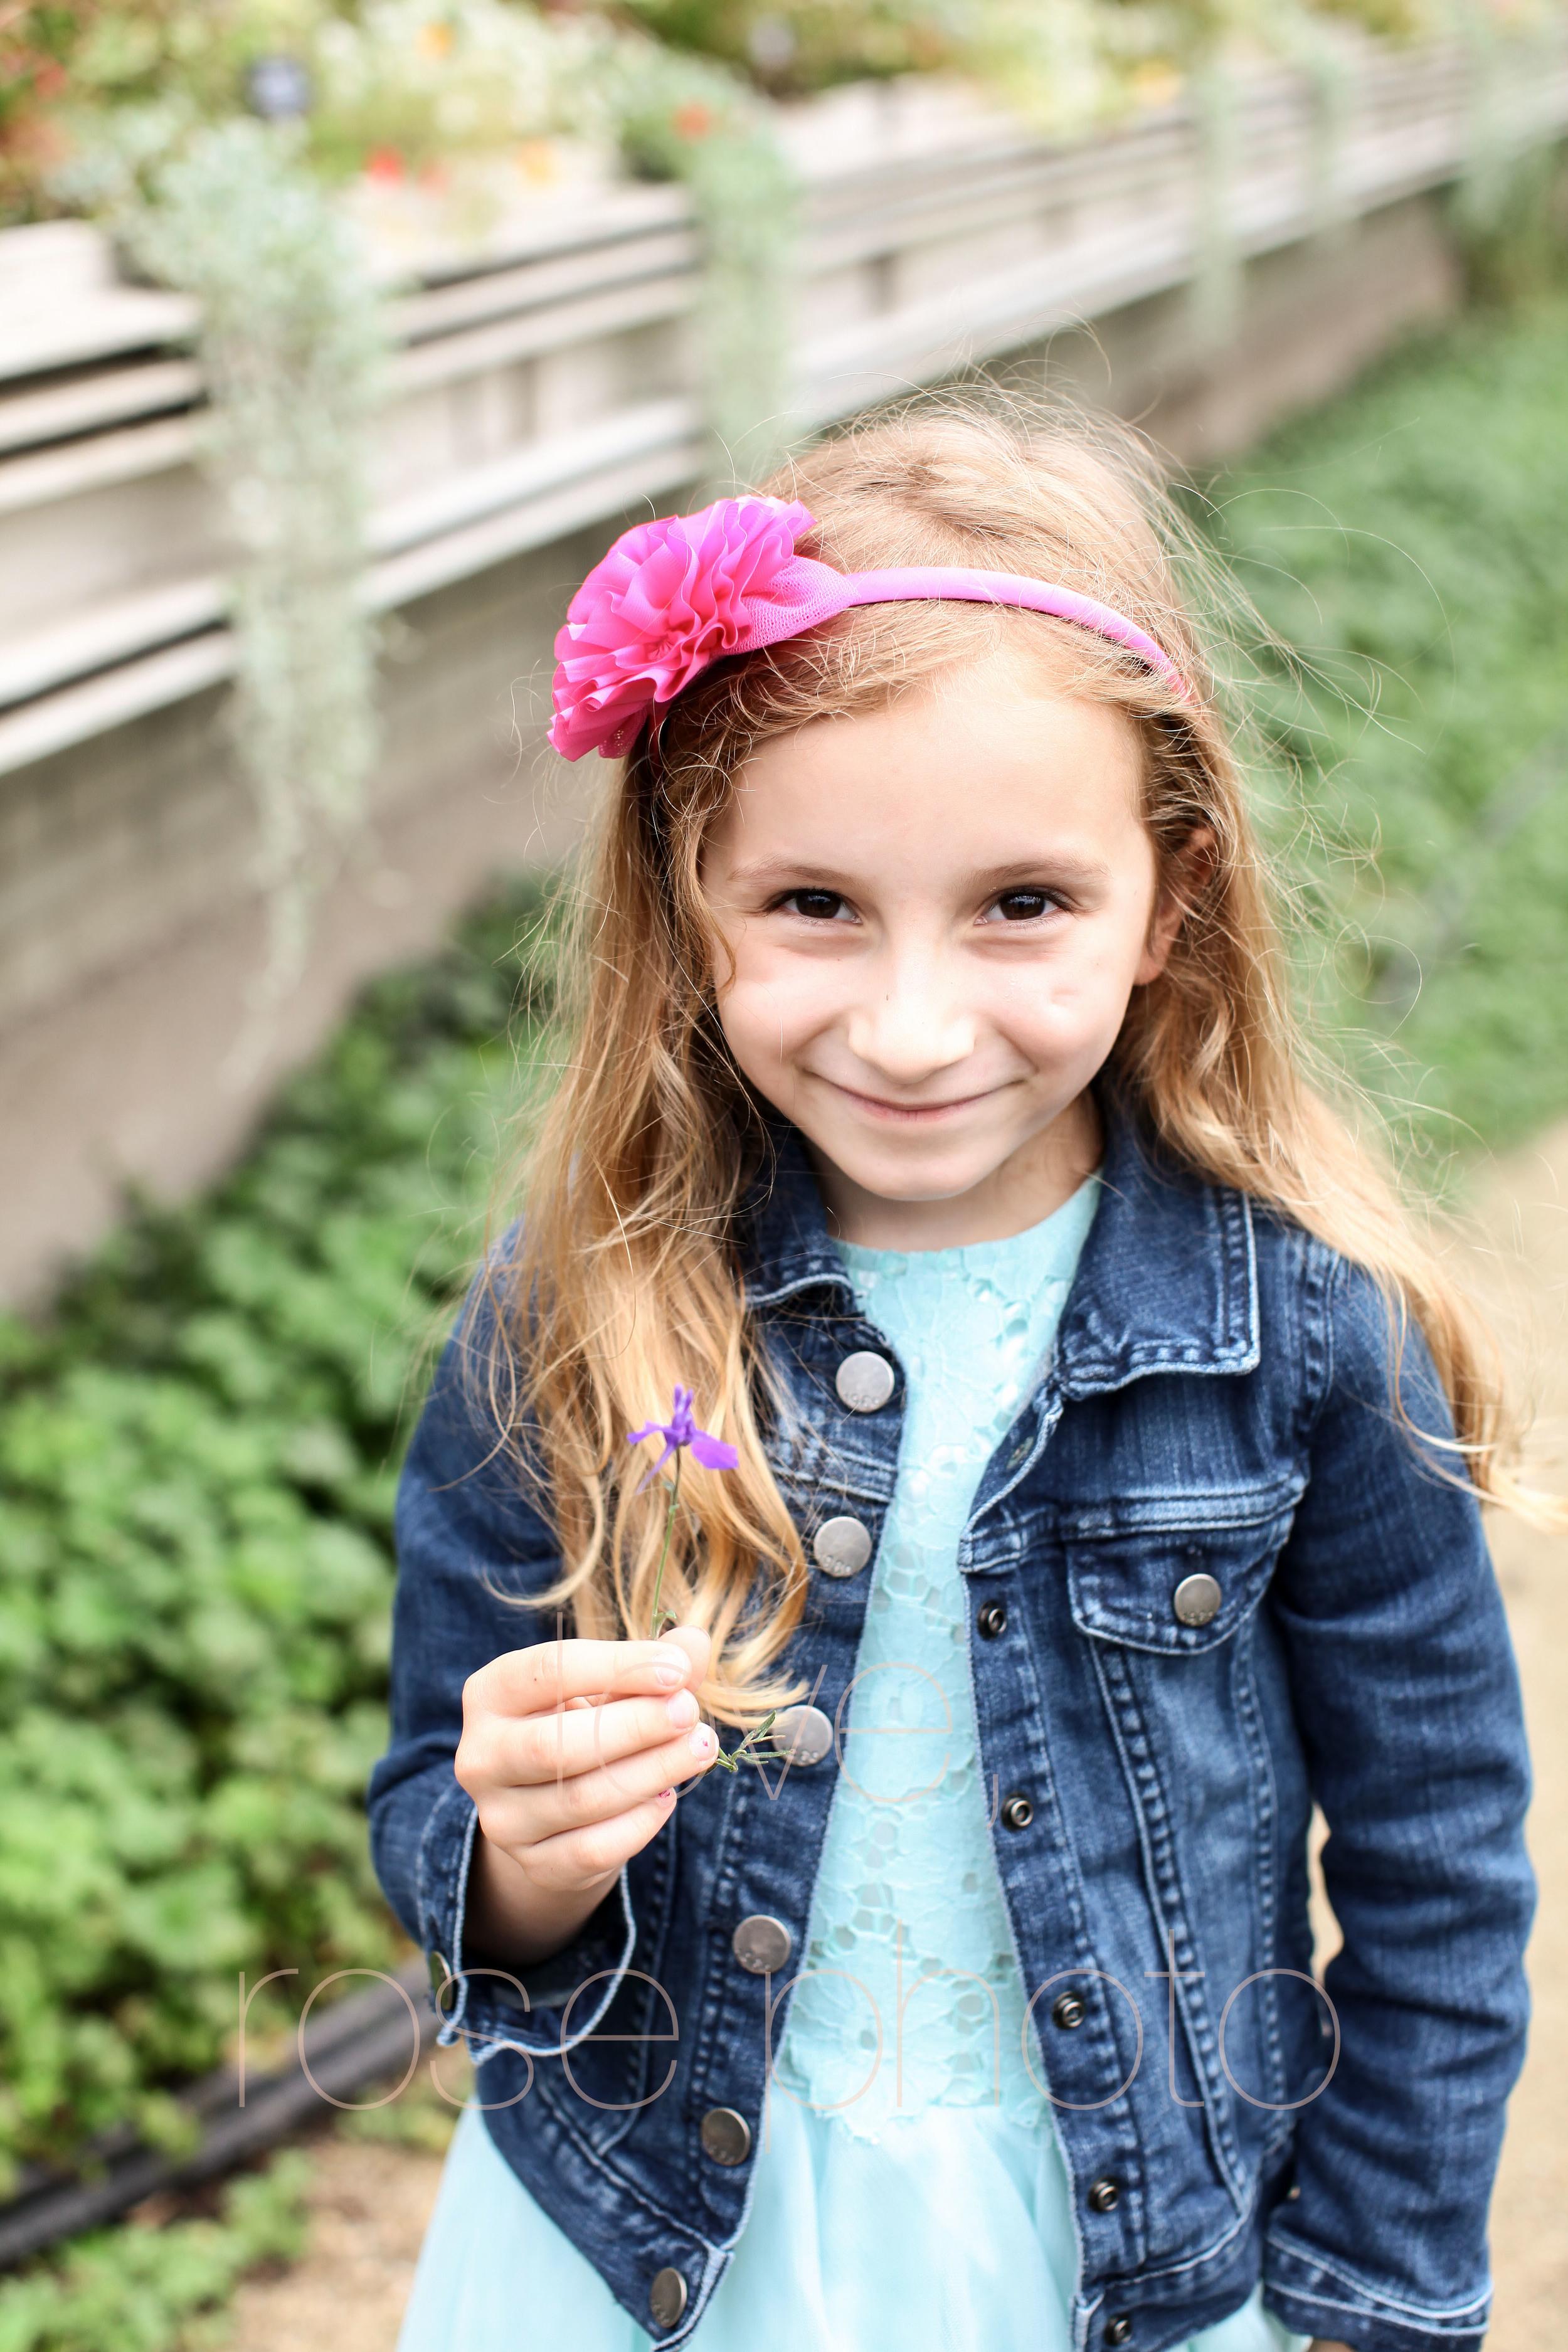 M jedrzejowski Summer 2015 Chicago childrens photographer lifestyle photography kids photos -001-009.jpg